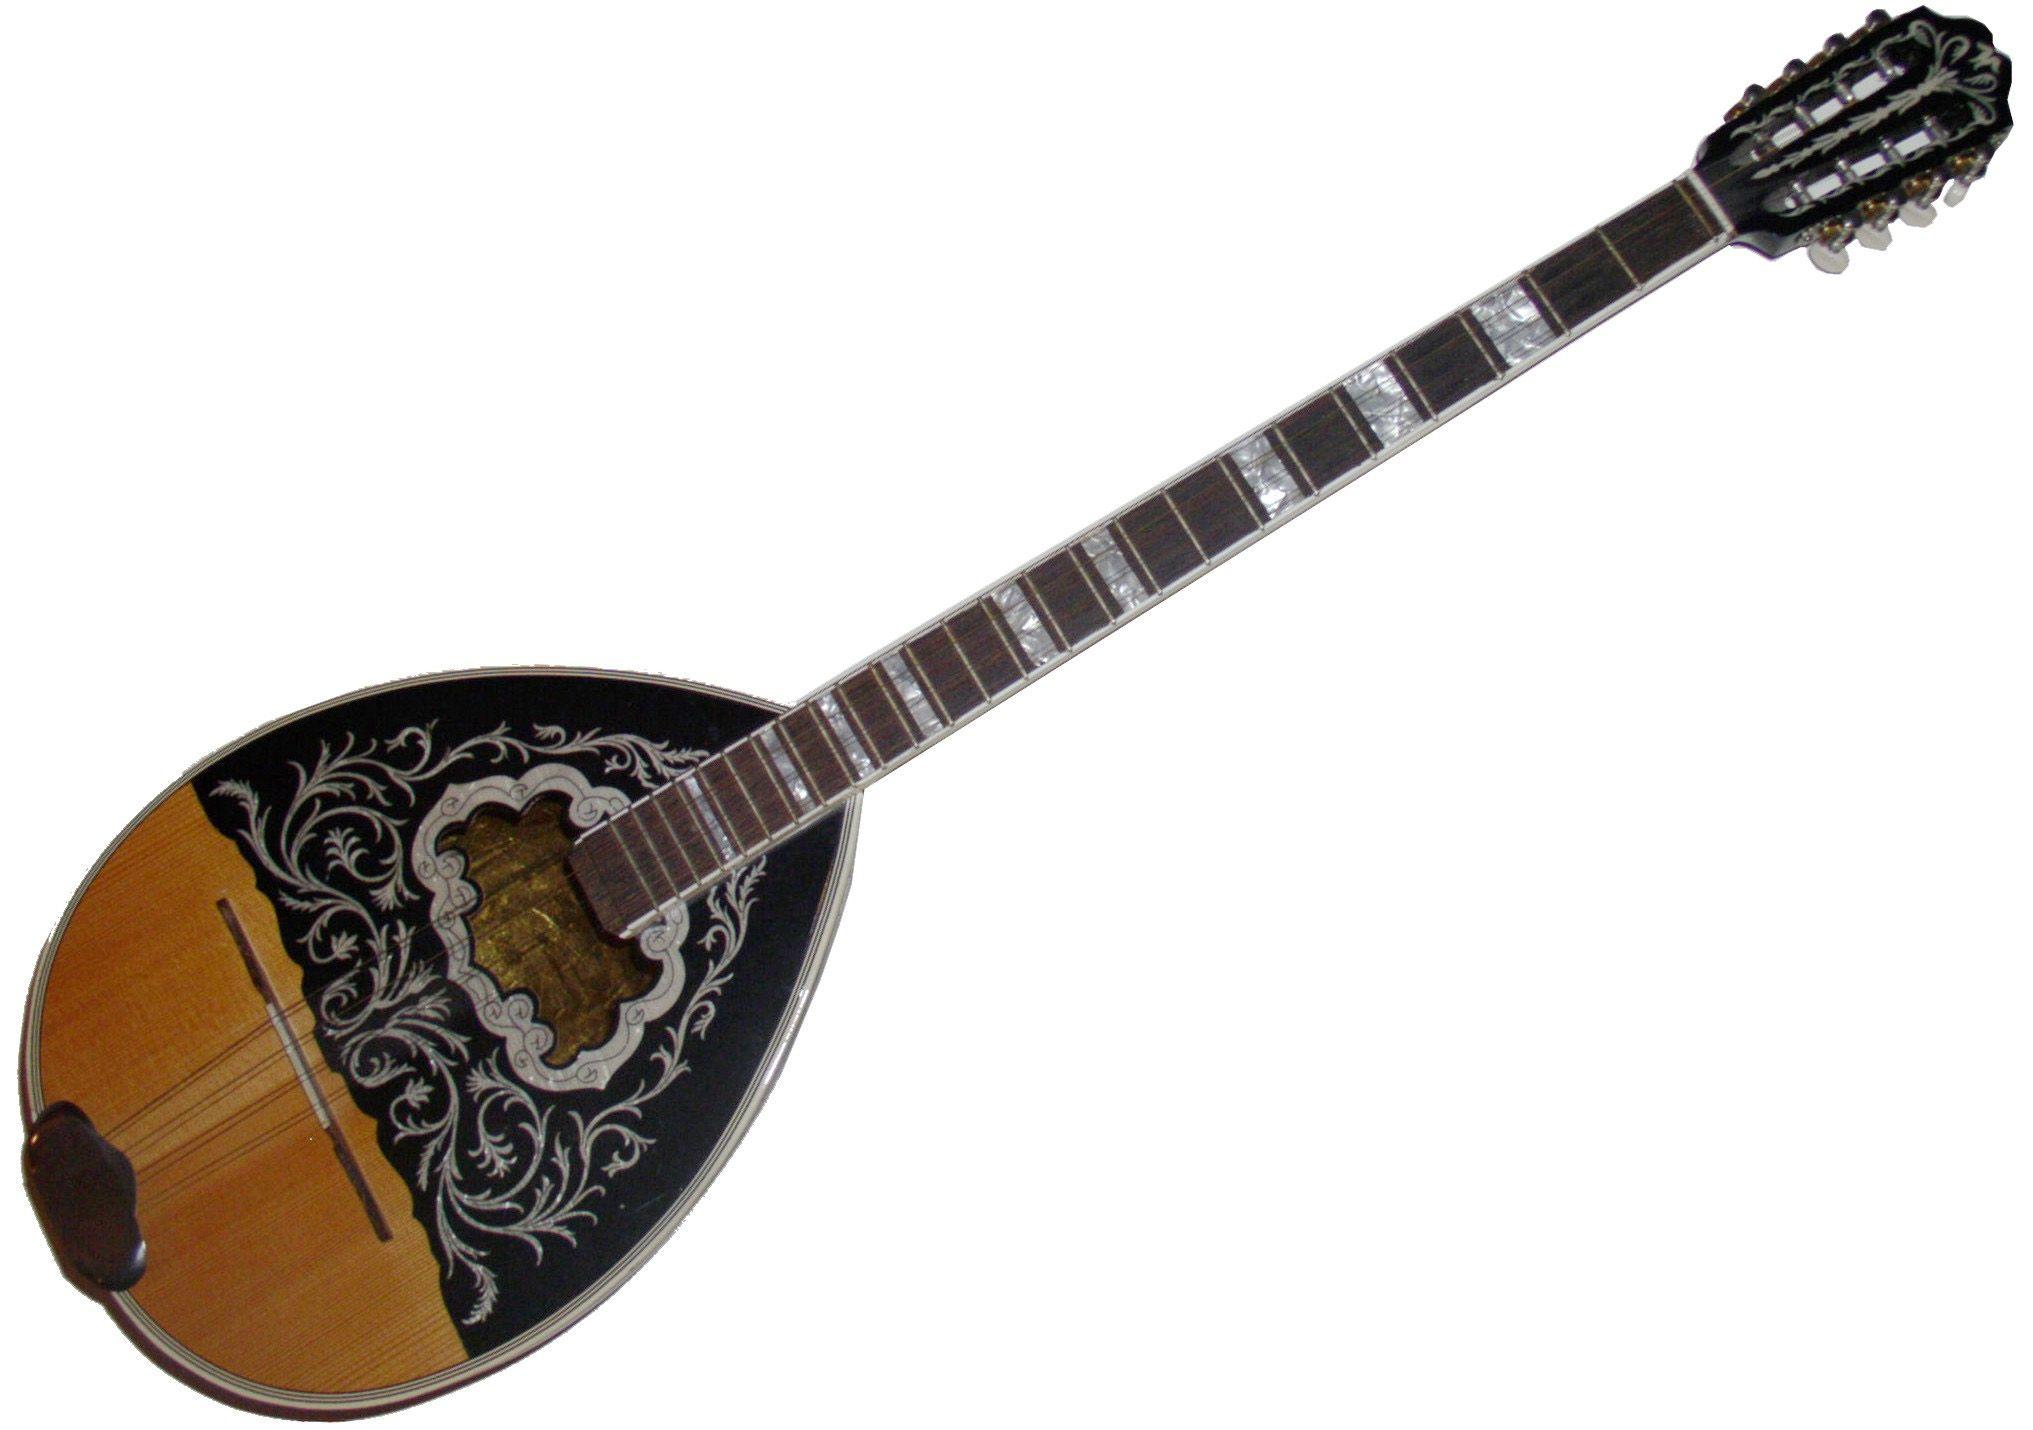 instruments greek musical toptenreviews irish unusual instrument notation software origin bouzouki